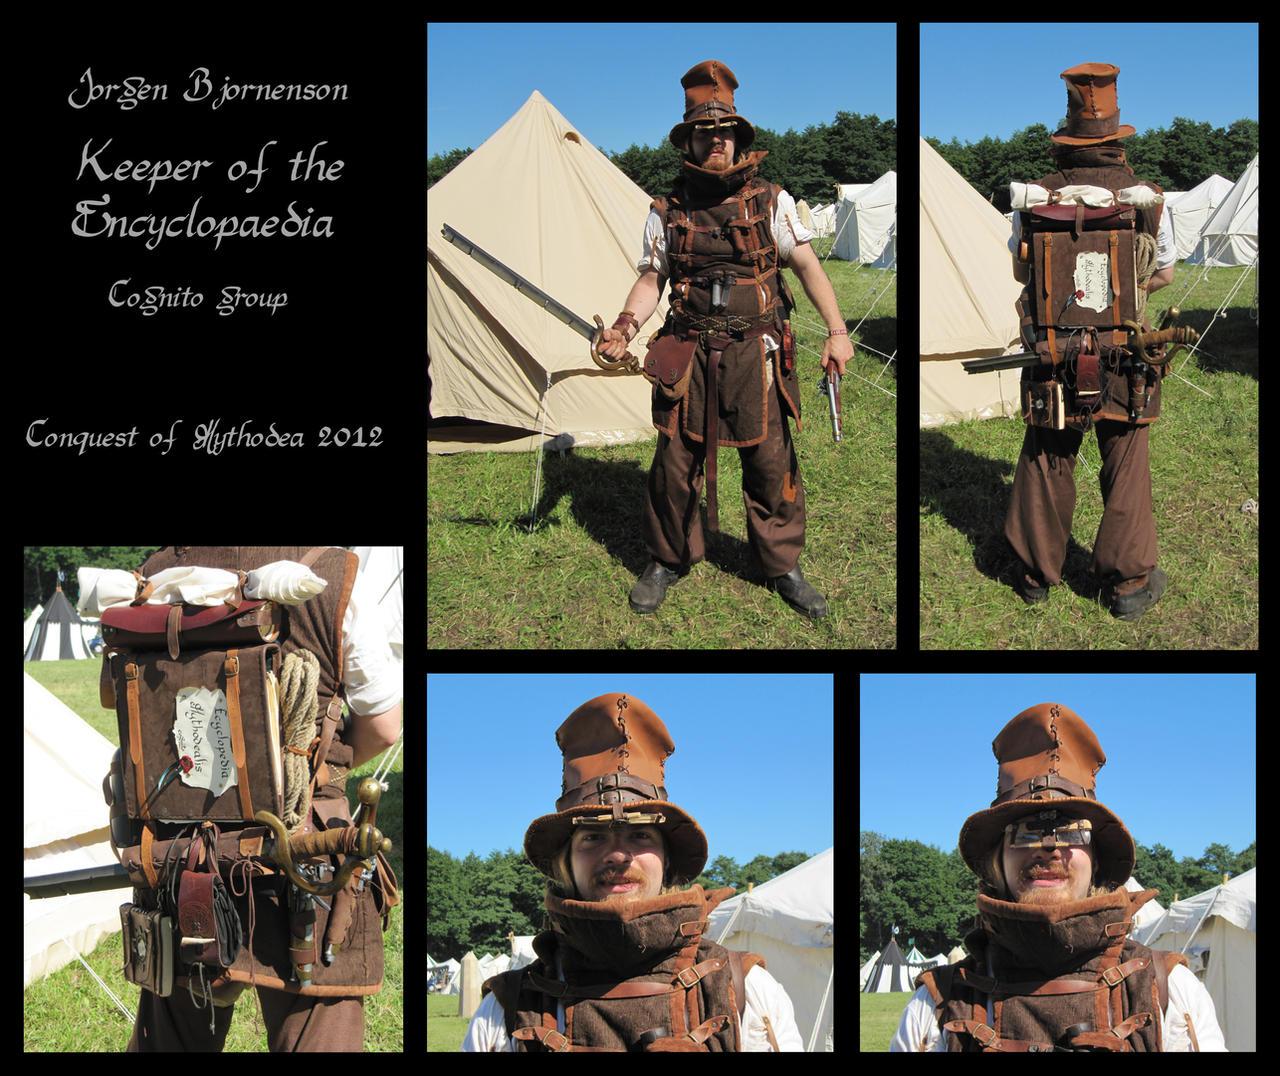 Jorgen, Keeper of the Encyclopeadia by carlviking